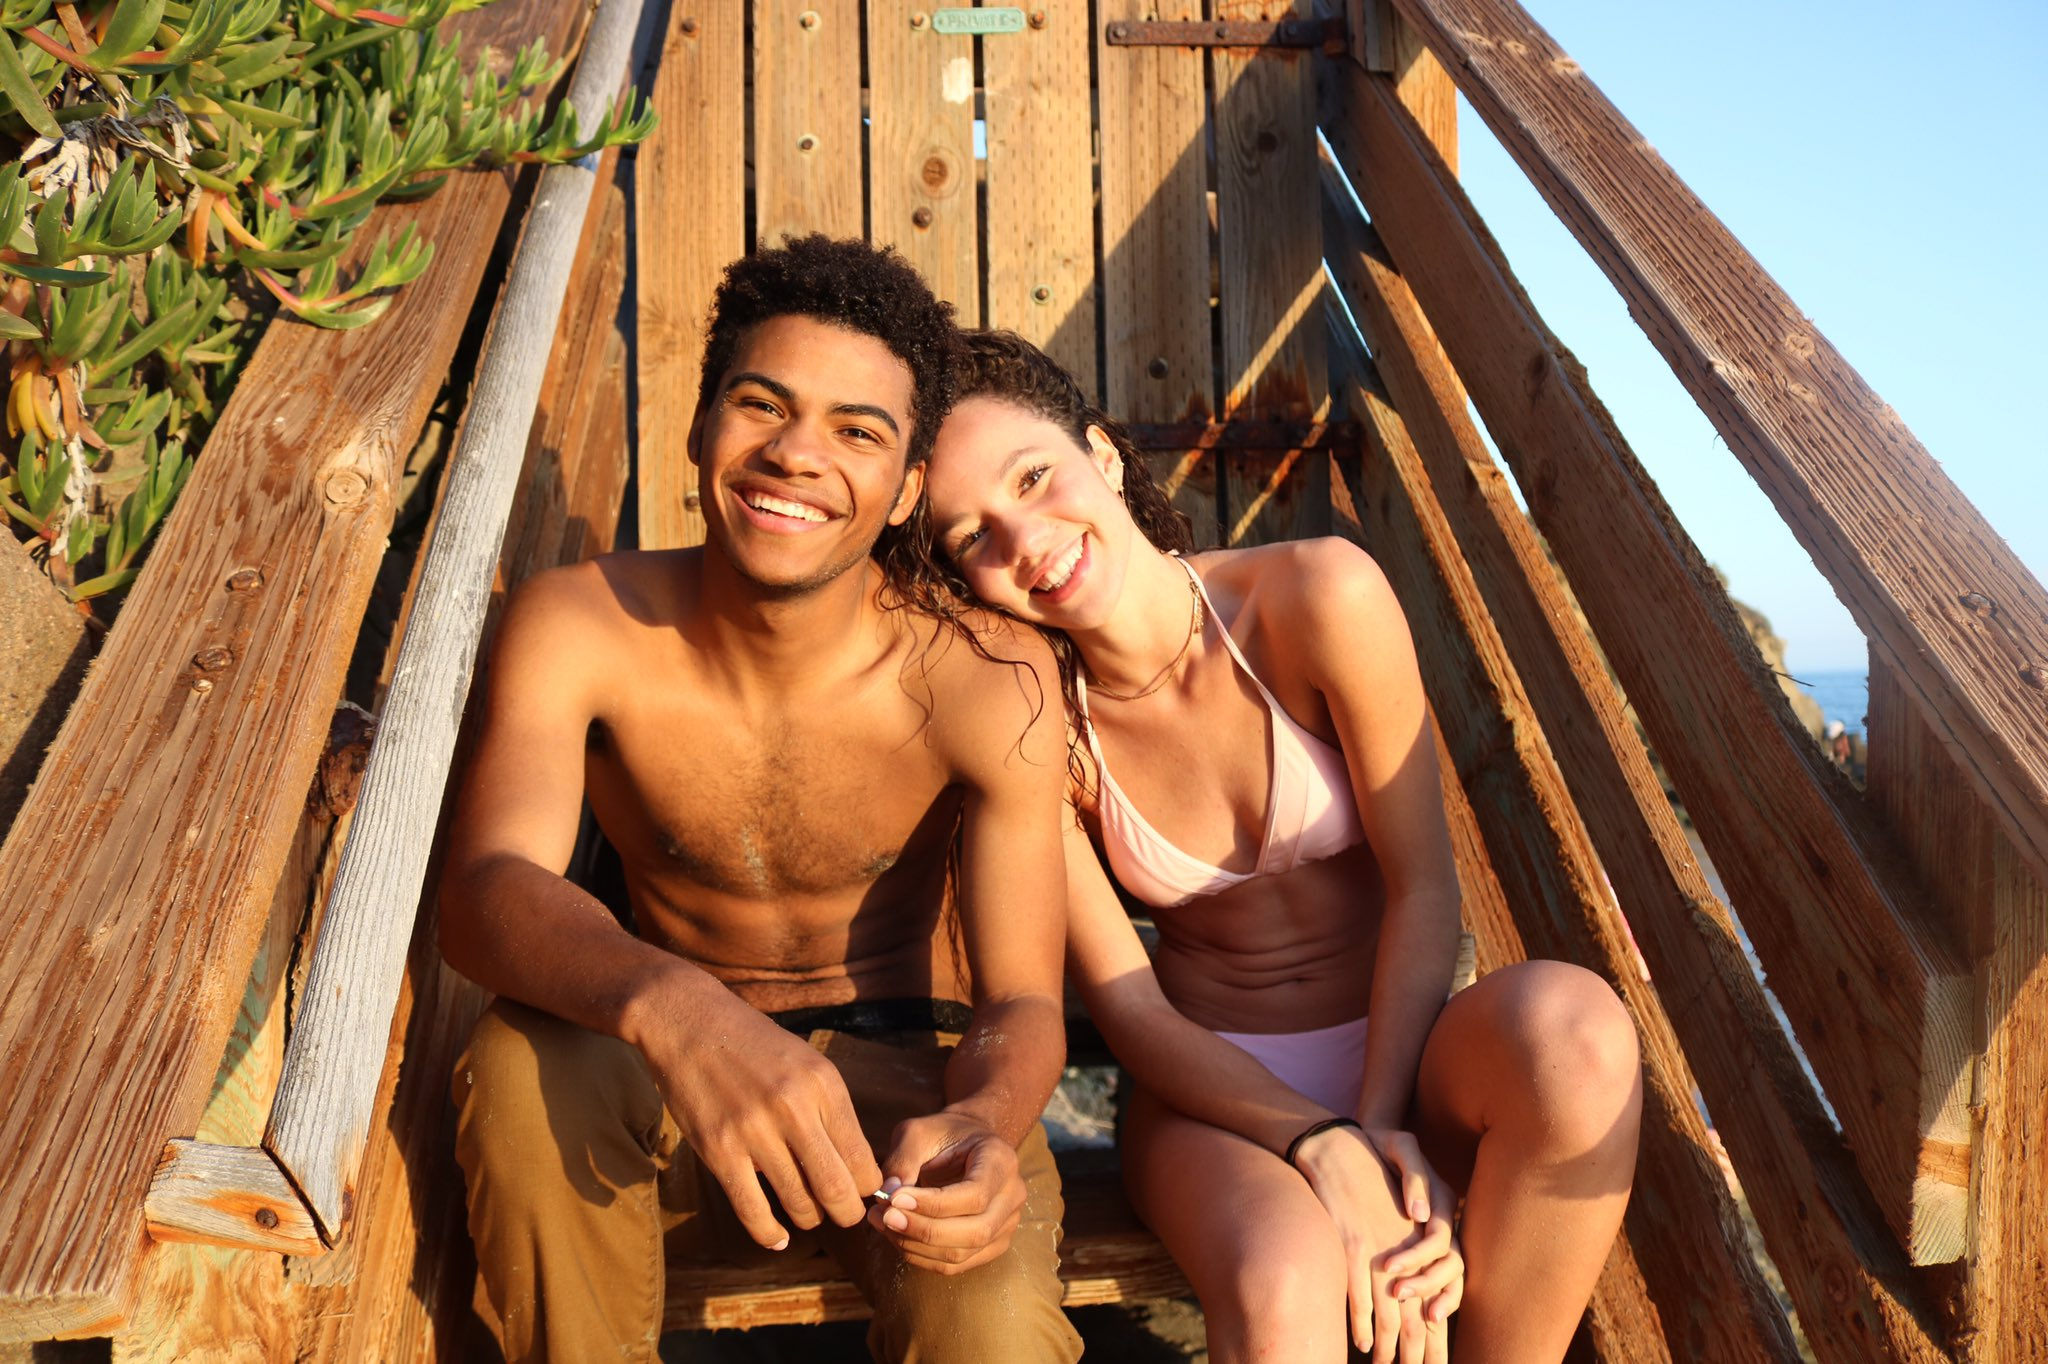 Noah Alexander Gerry & Lexie Stevenson